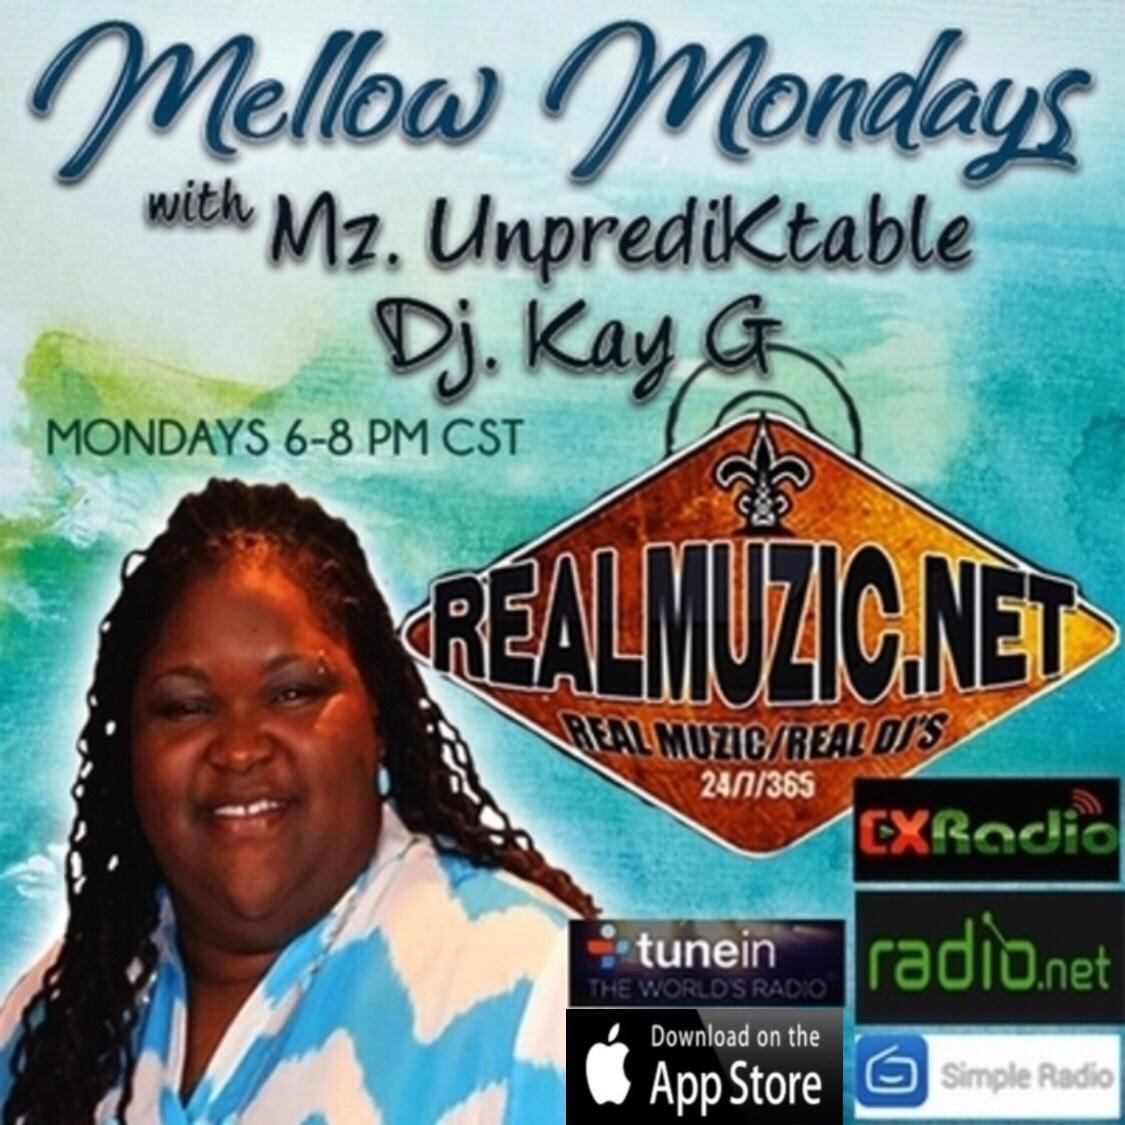 Mz UnprediKtable DJ Kay G